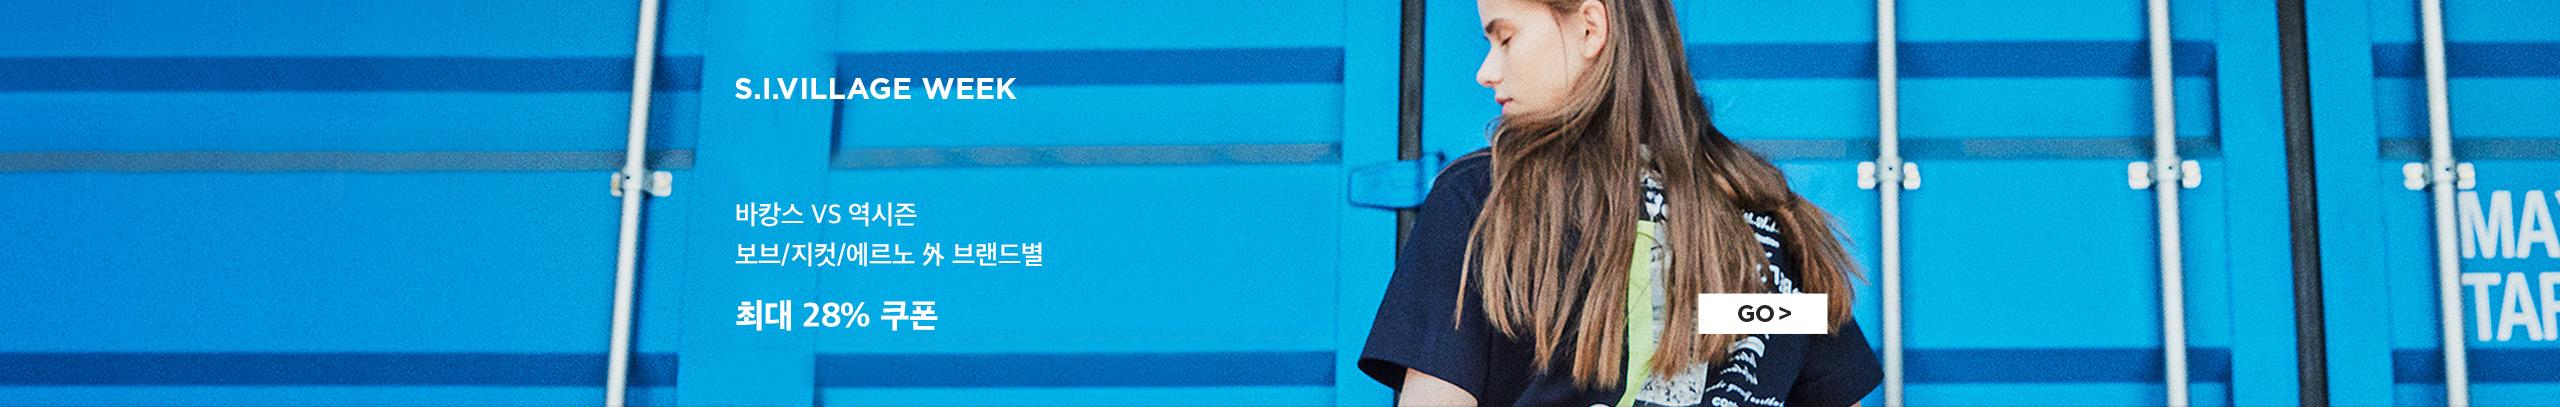 [S.I.VILLAGE WEEK] 바캉스 VS 역시즌. 보브/지컷/에르노 외 브랜드별 최대 28% 쿠폰 GO